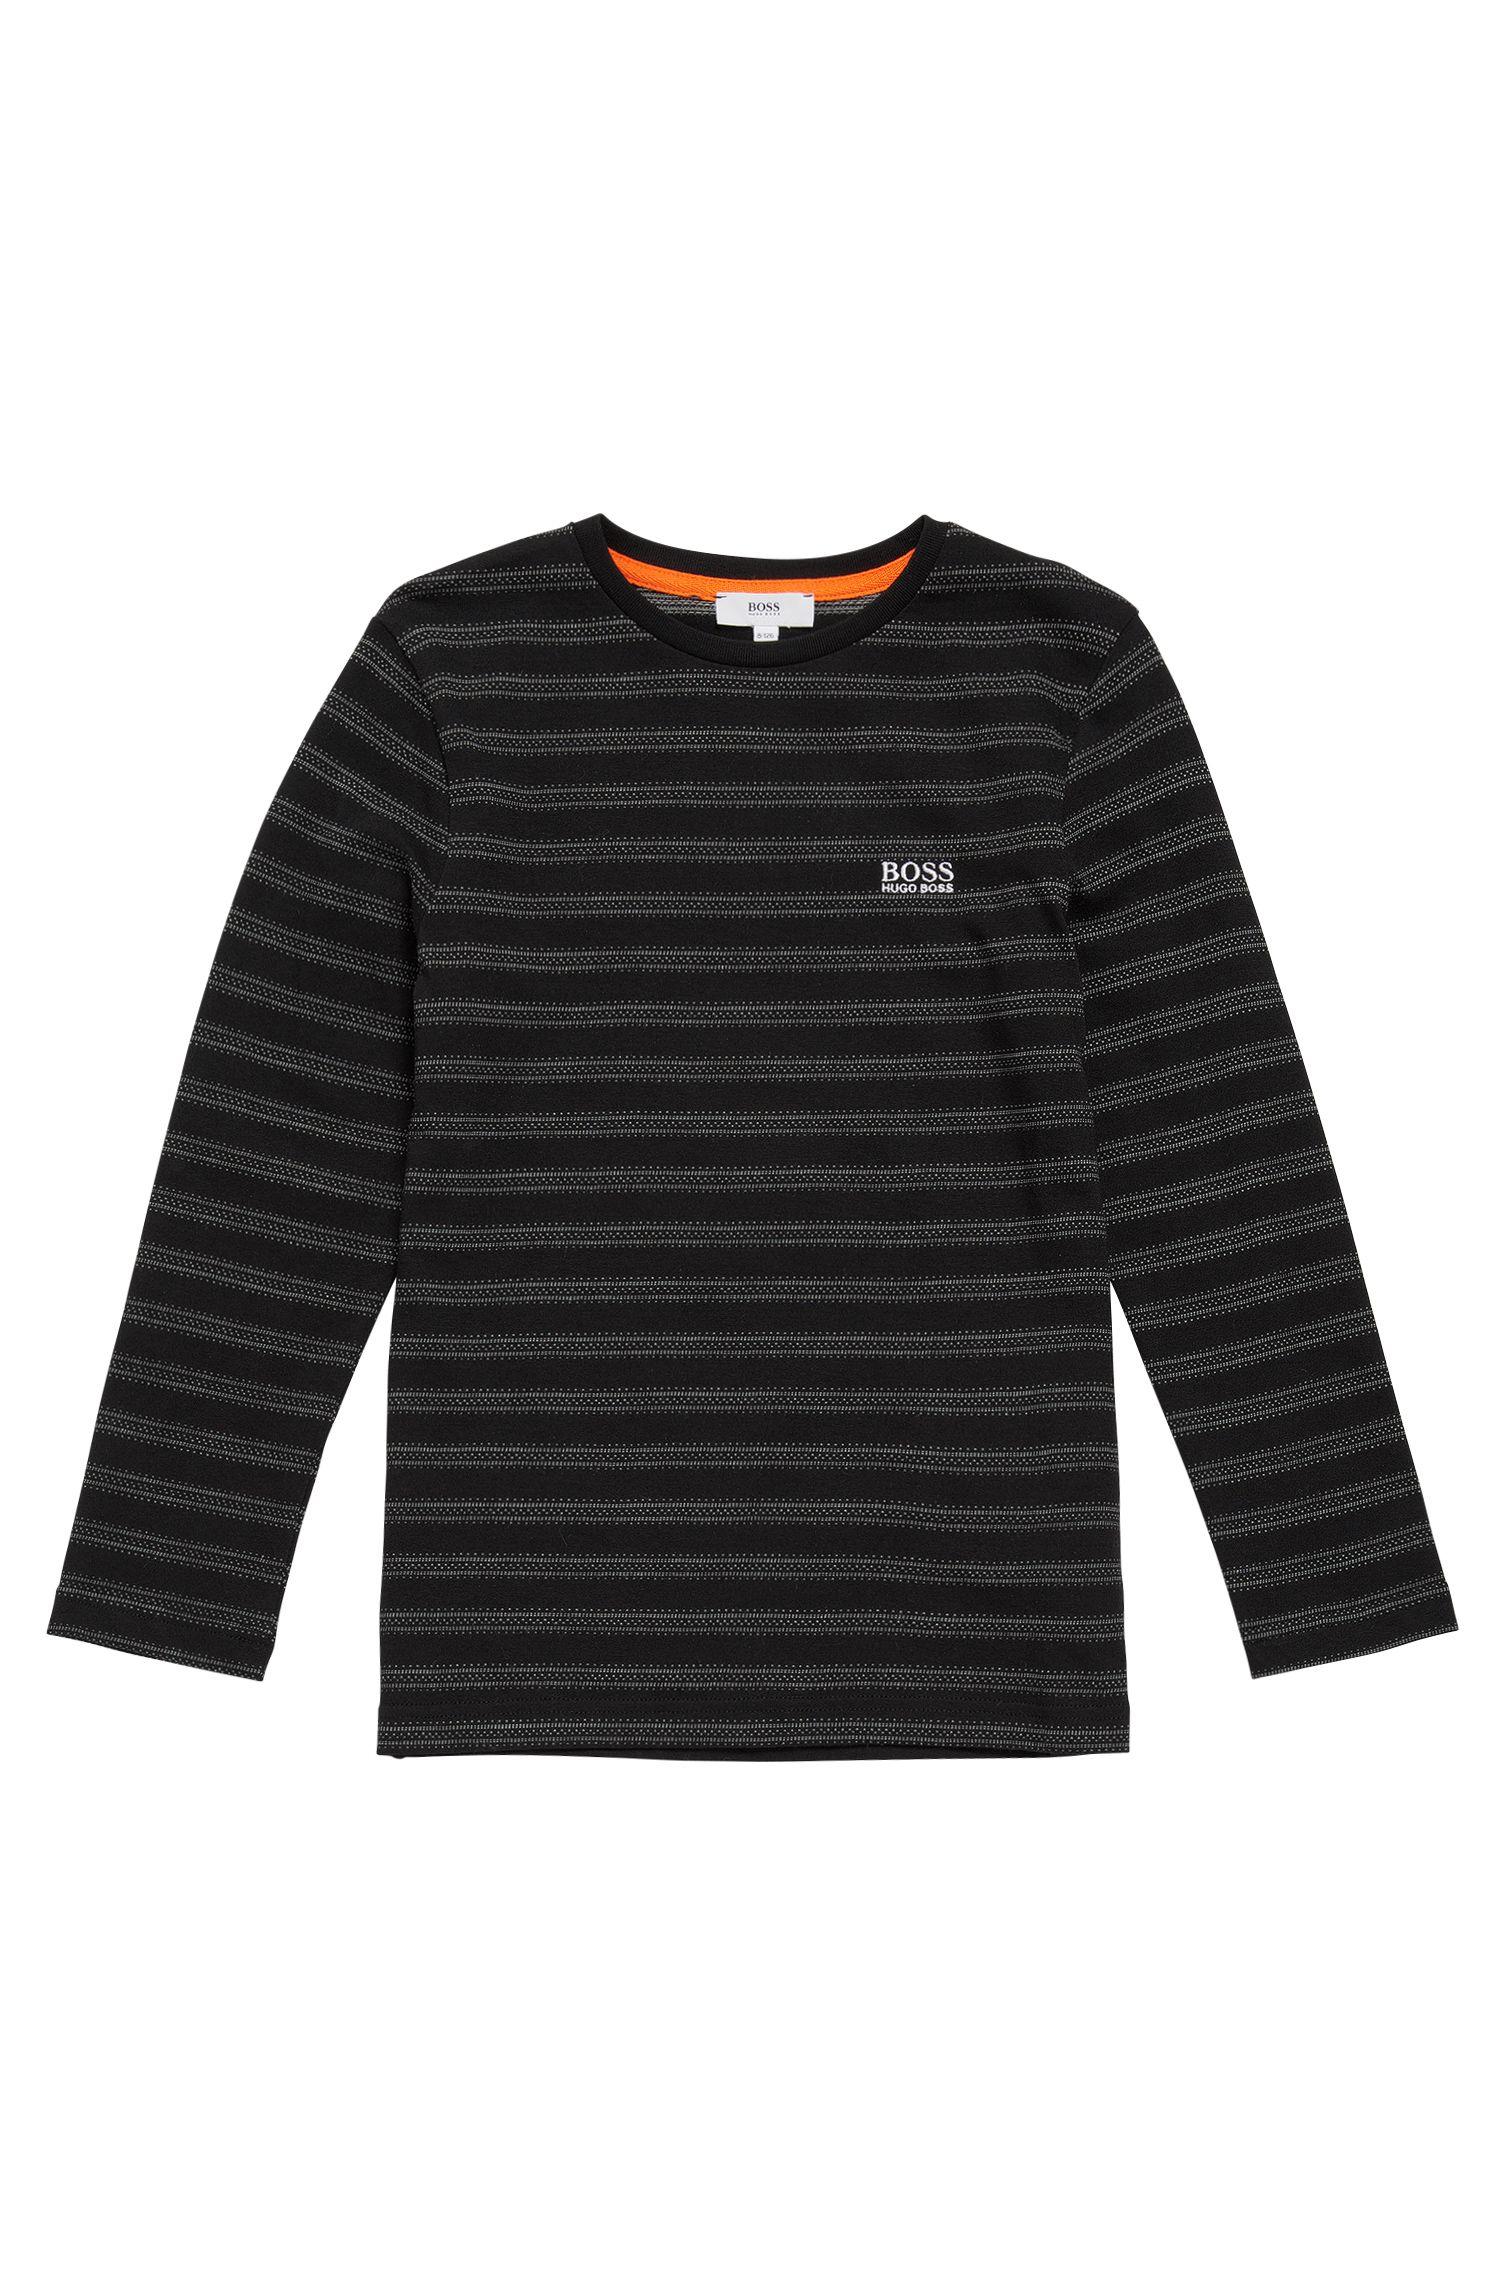 'J25A37' | Boys Cotton Long Sleeve T-Shirt